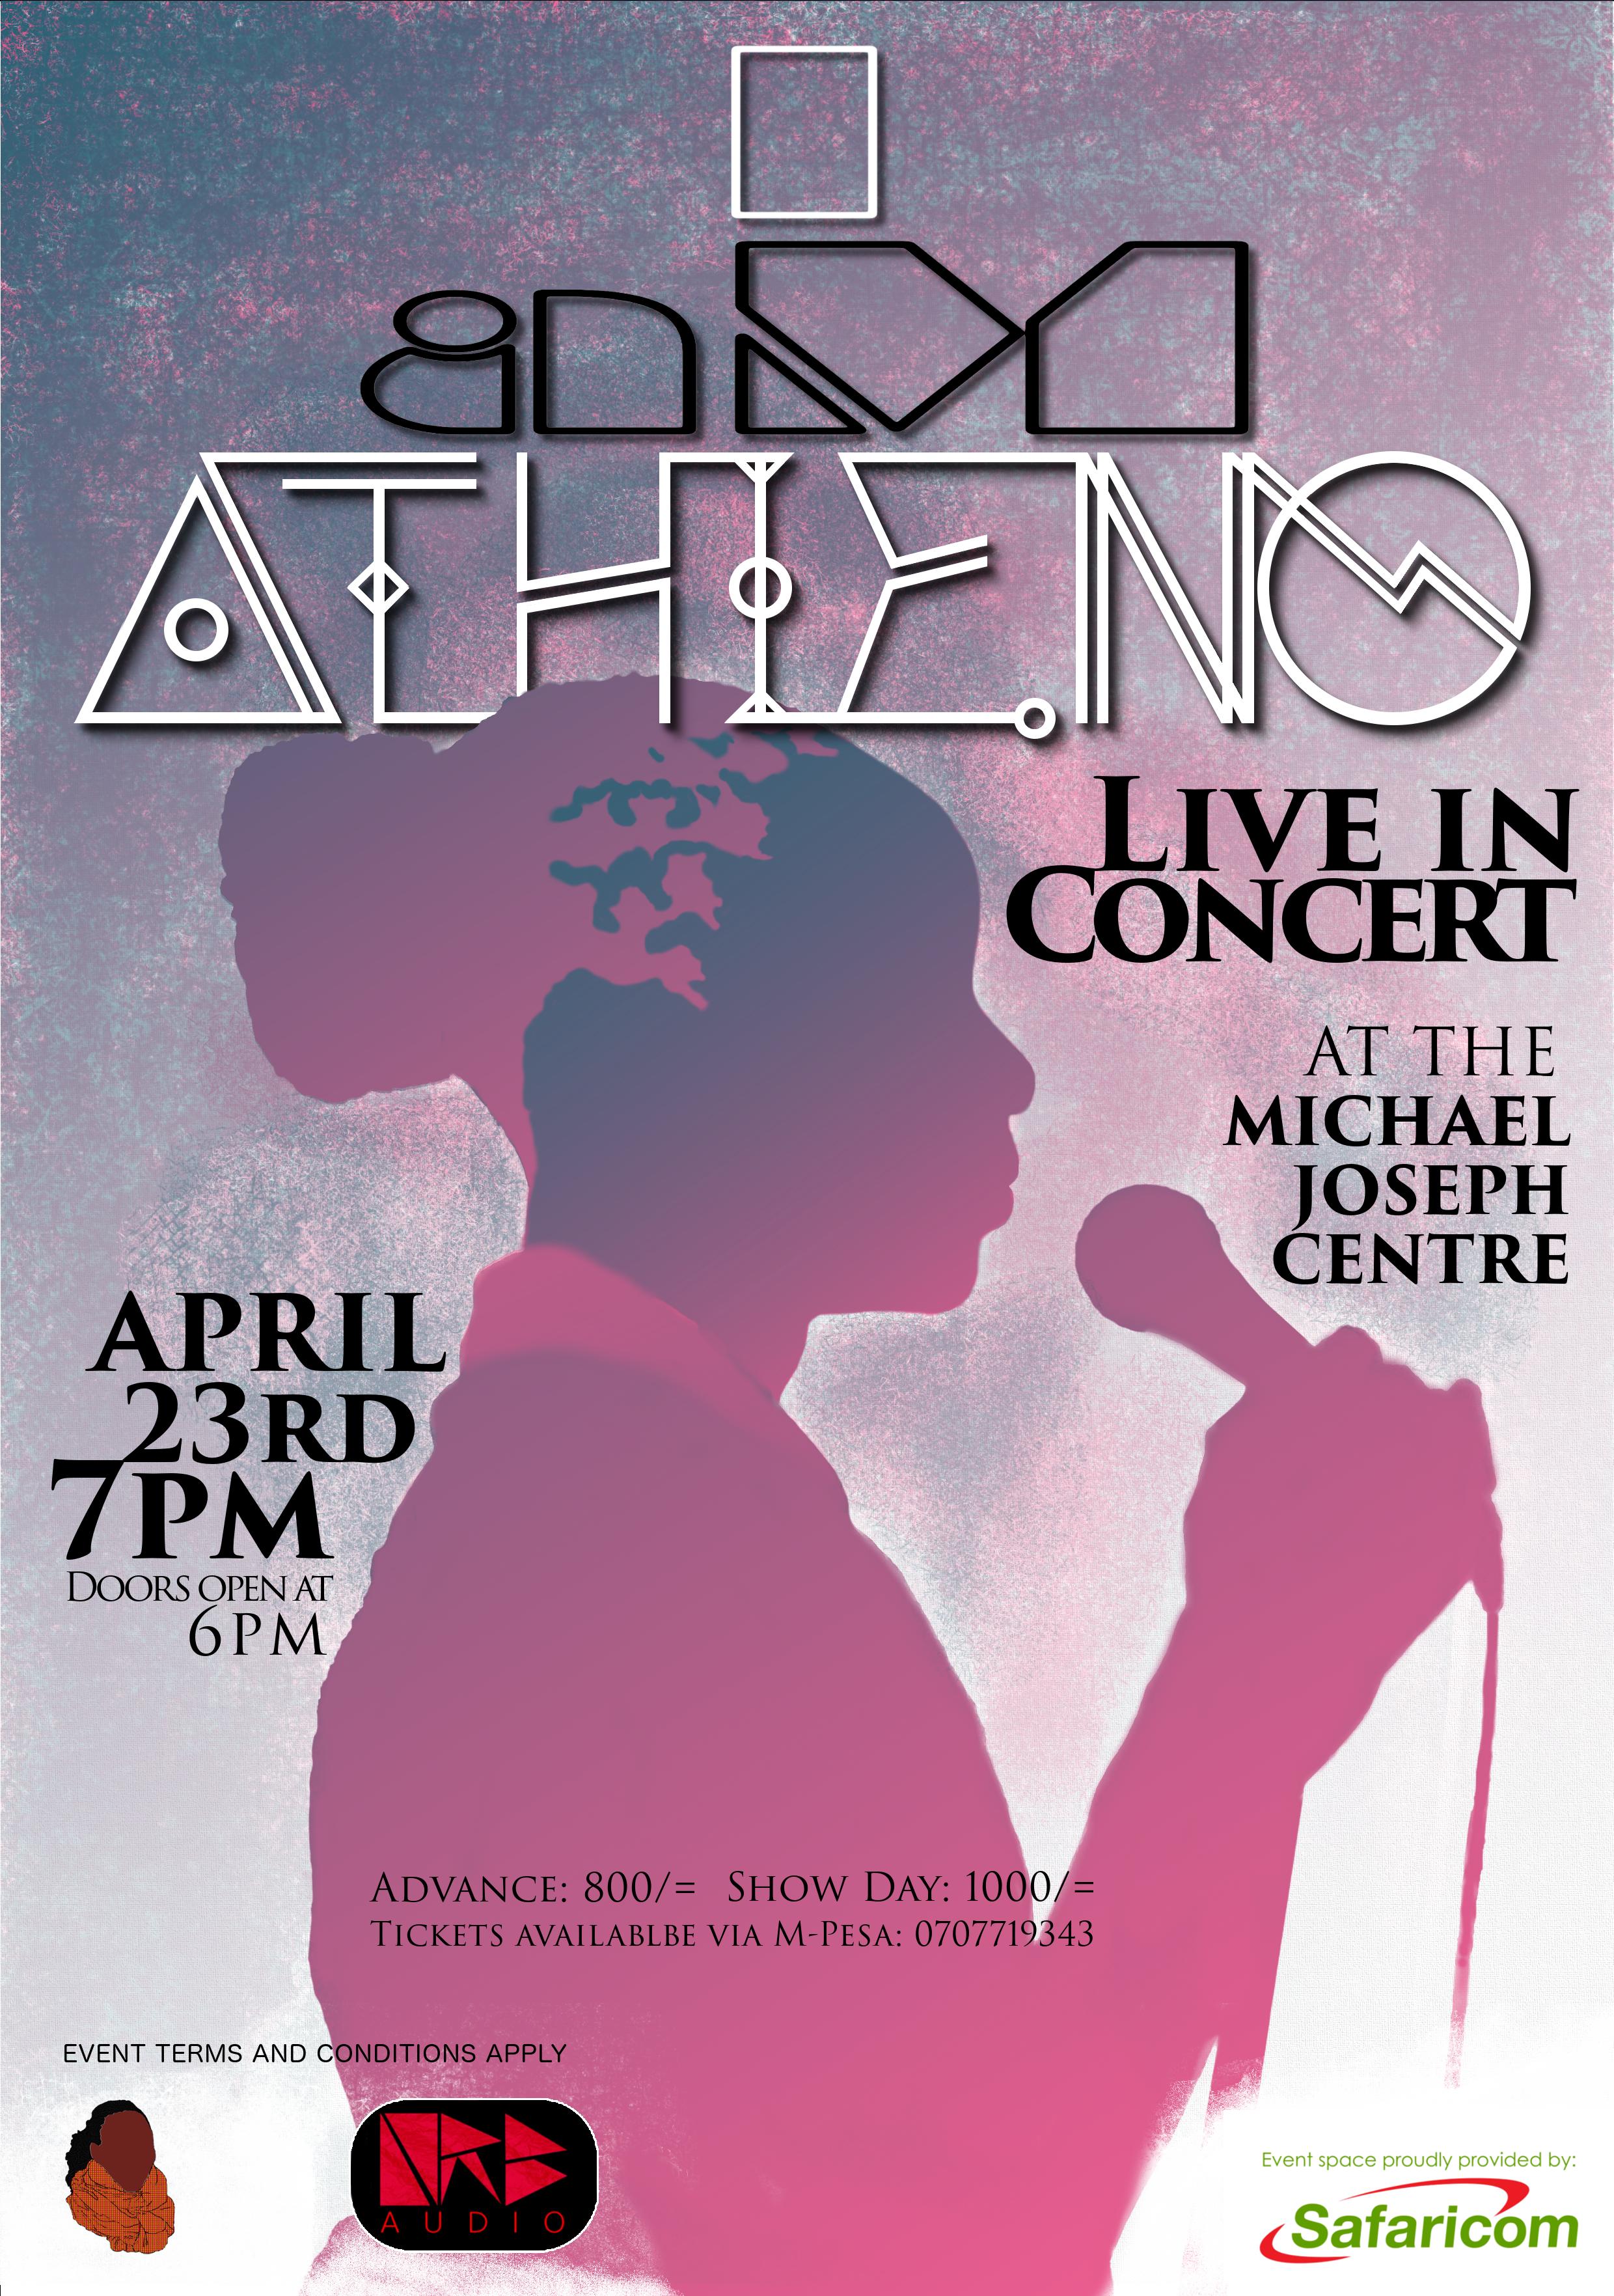 I aM ATHIENO: Live in Concert (April 23rd 2016)